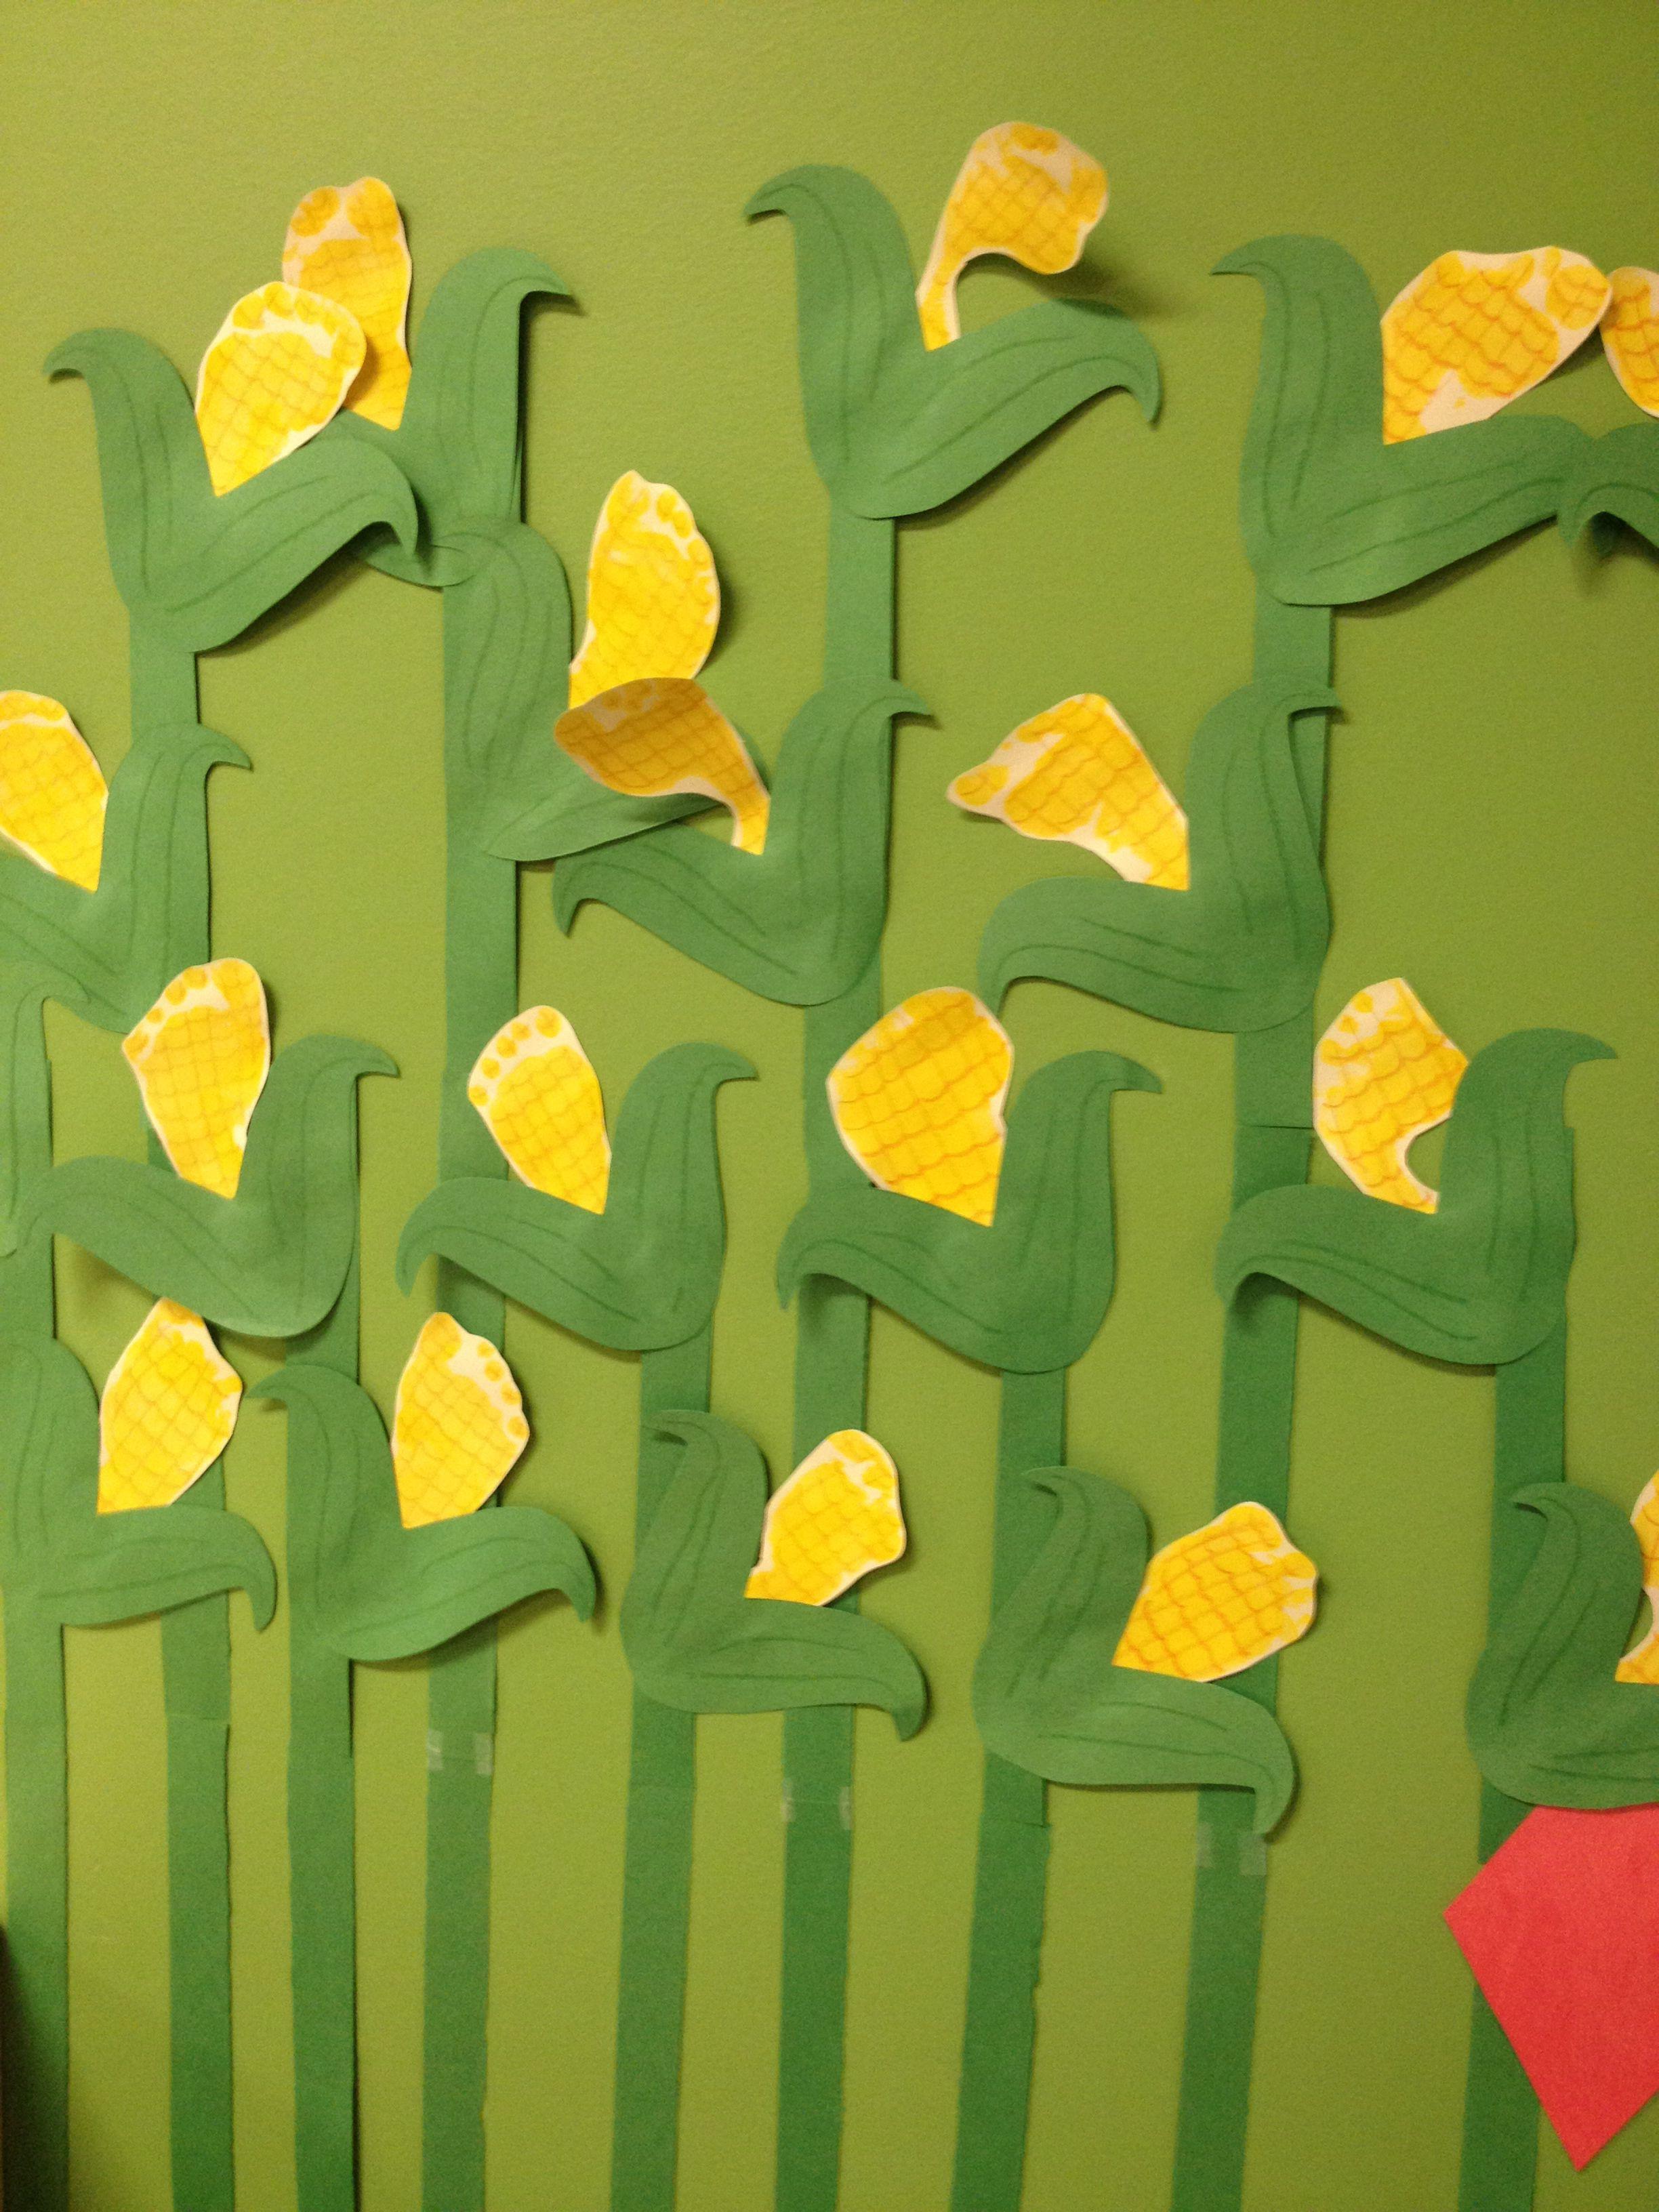 Footprint cornstalks! | Arts and Craft Ideas! | Pinterest ...